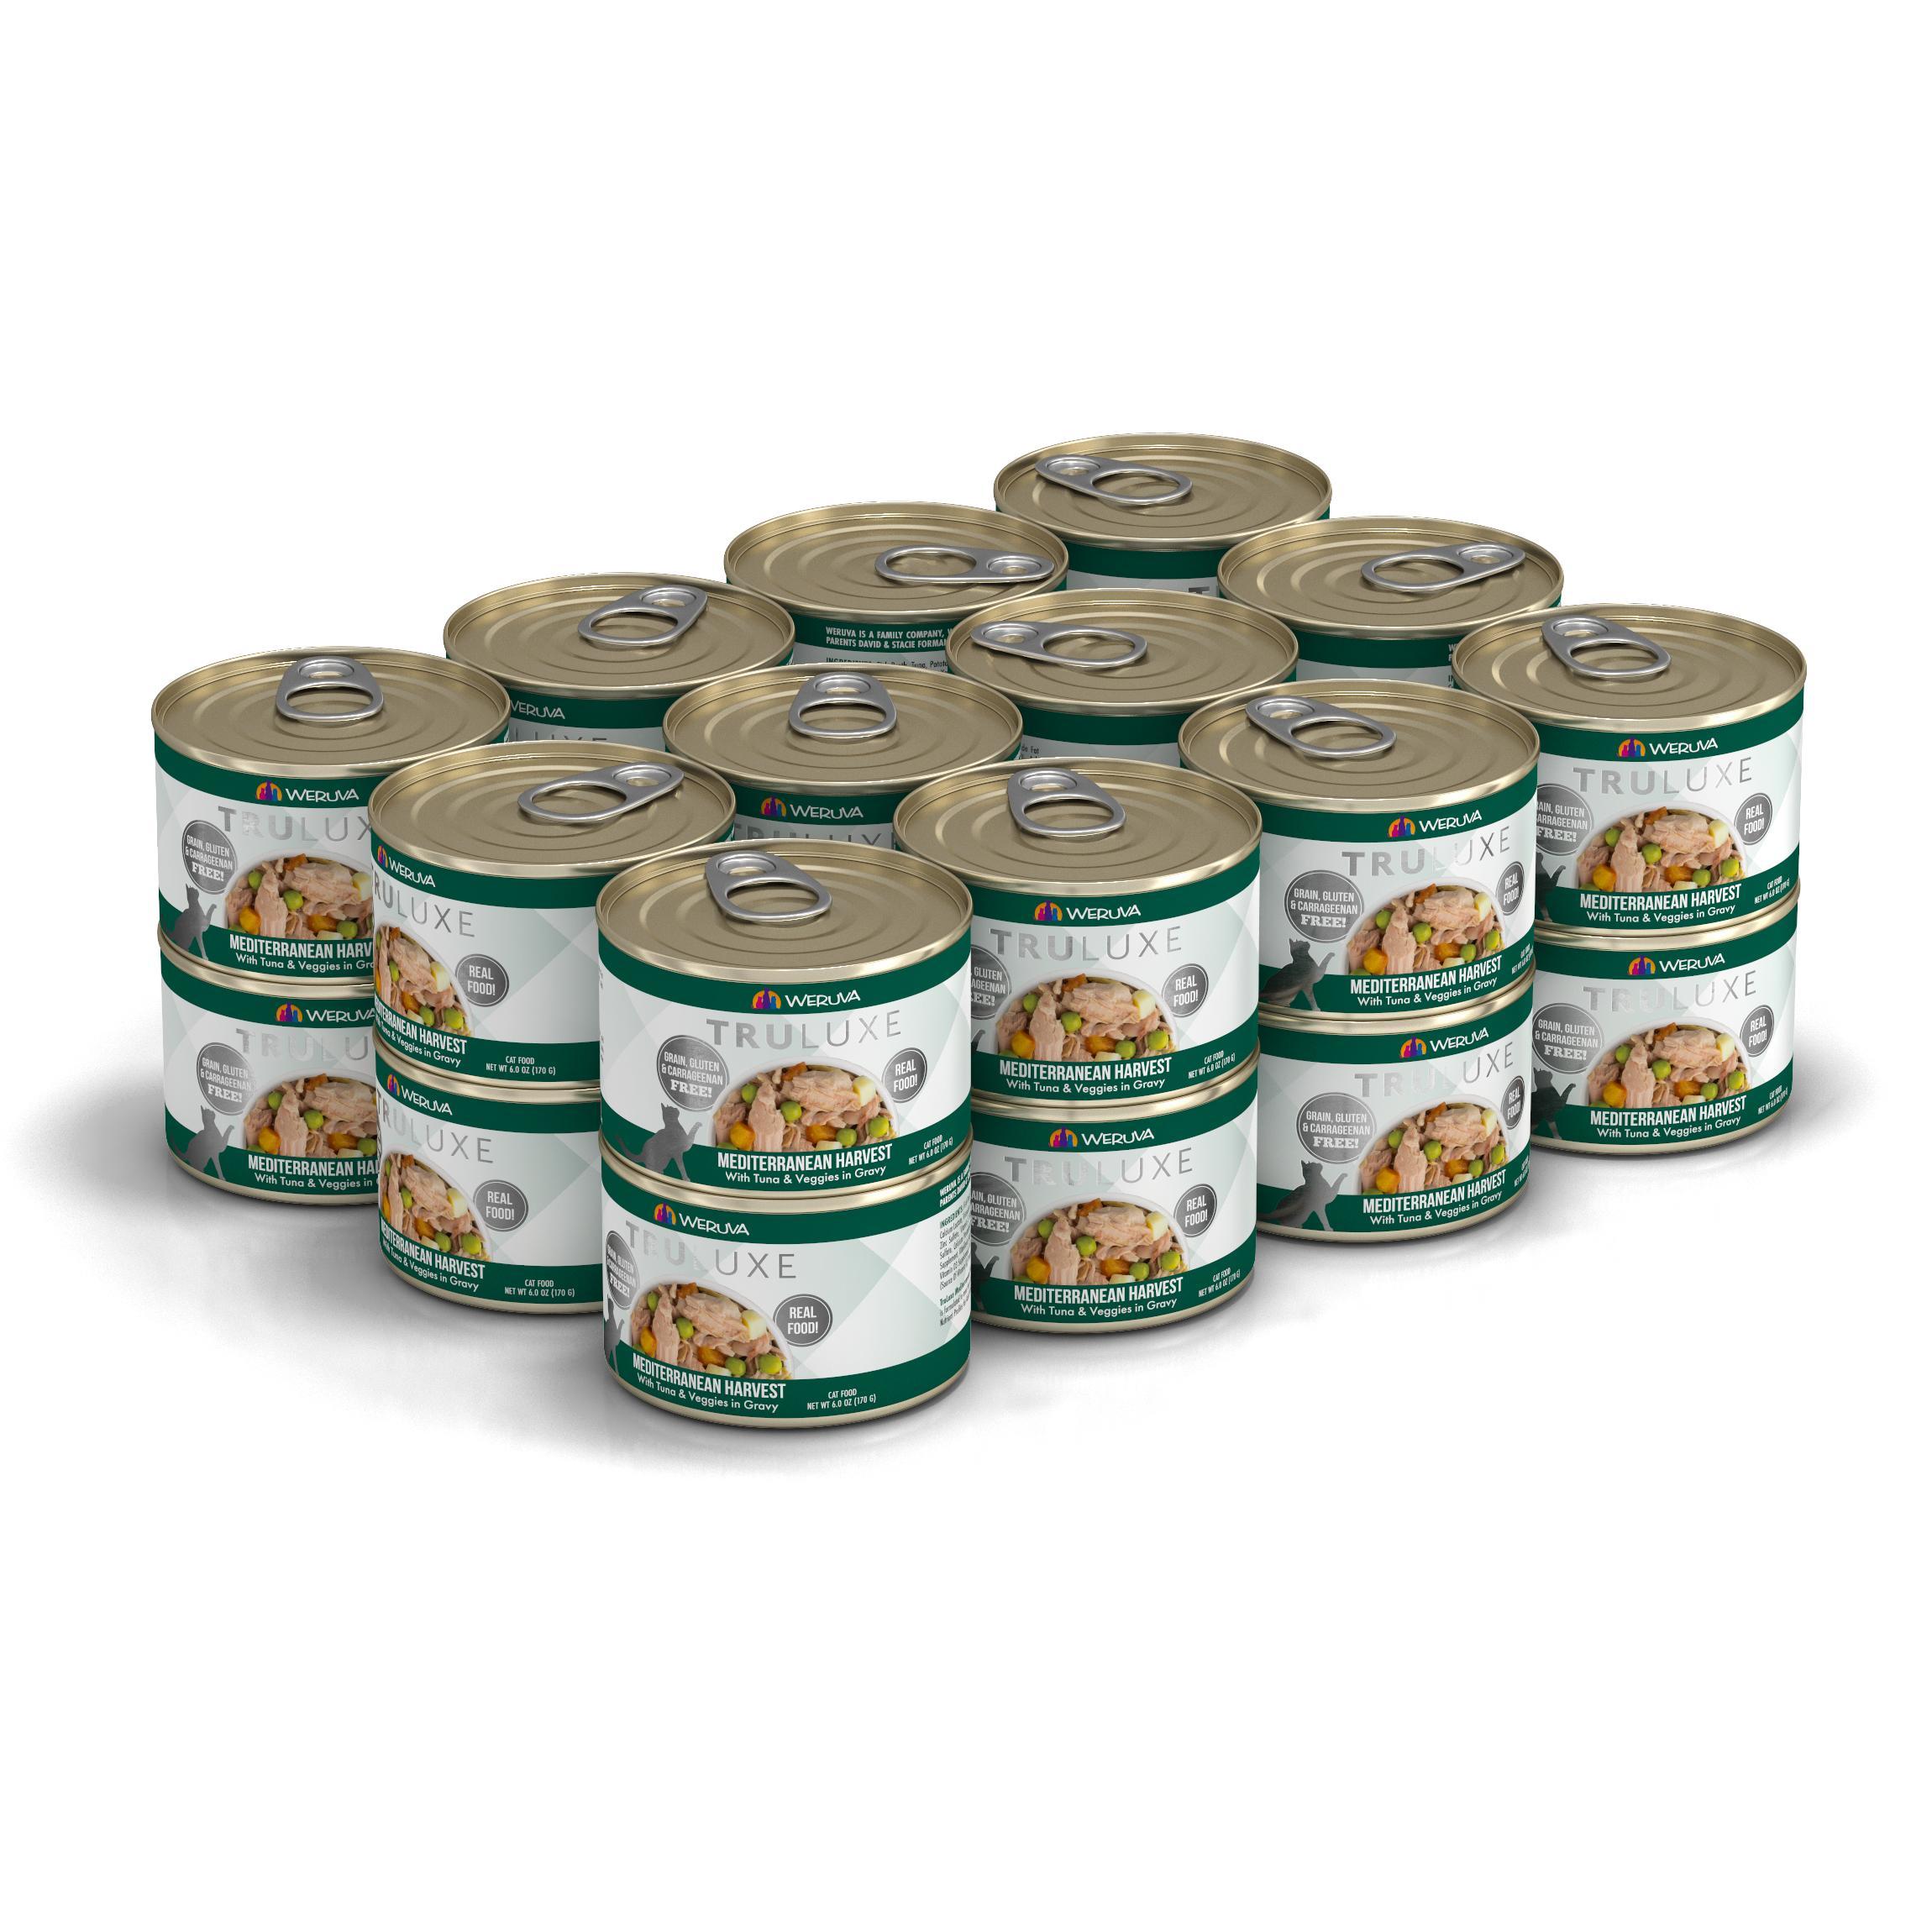 Weruva Cat Truluxe Mediterranean Harvest with Tuna & Veggies in Gravy Grain-Free Wet Cat Food, 6-oz, case of 24